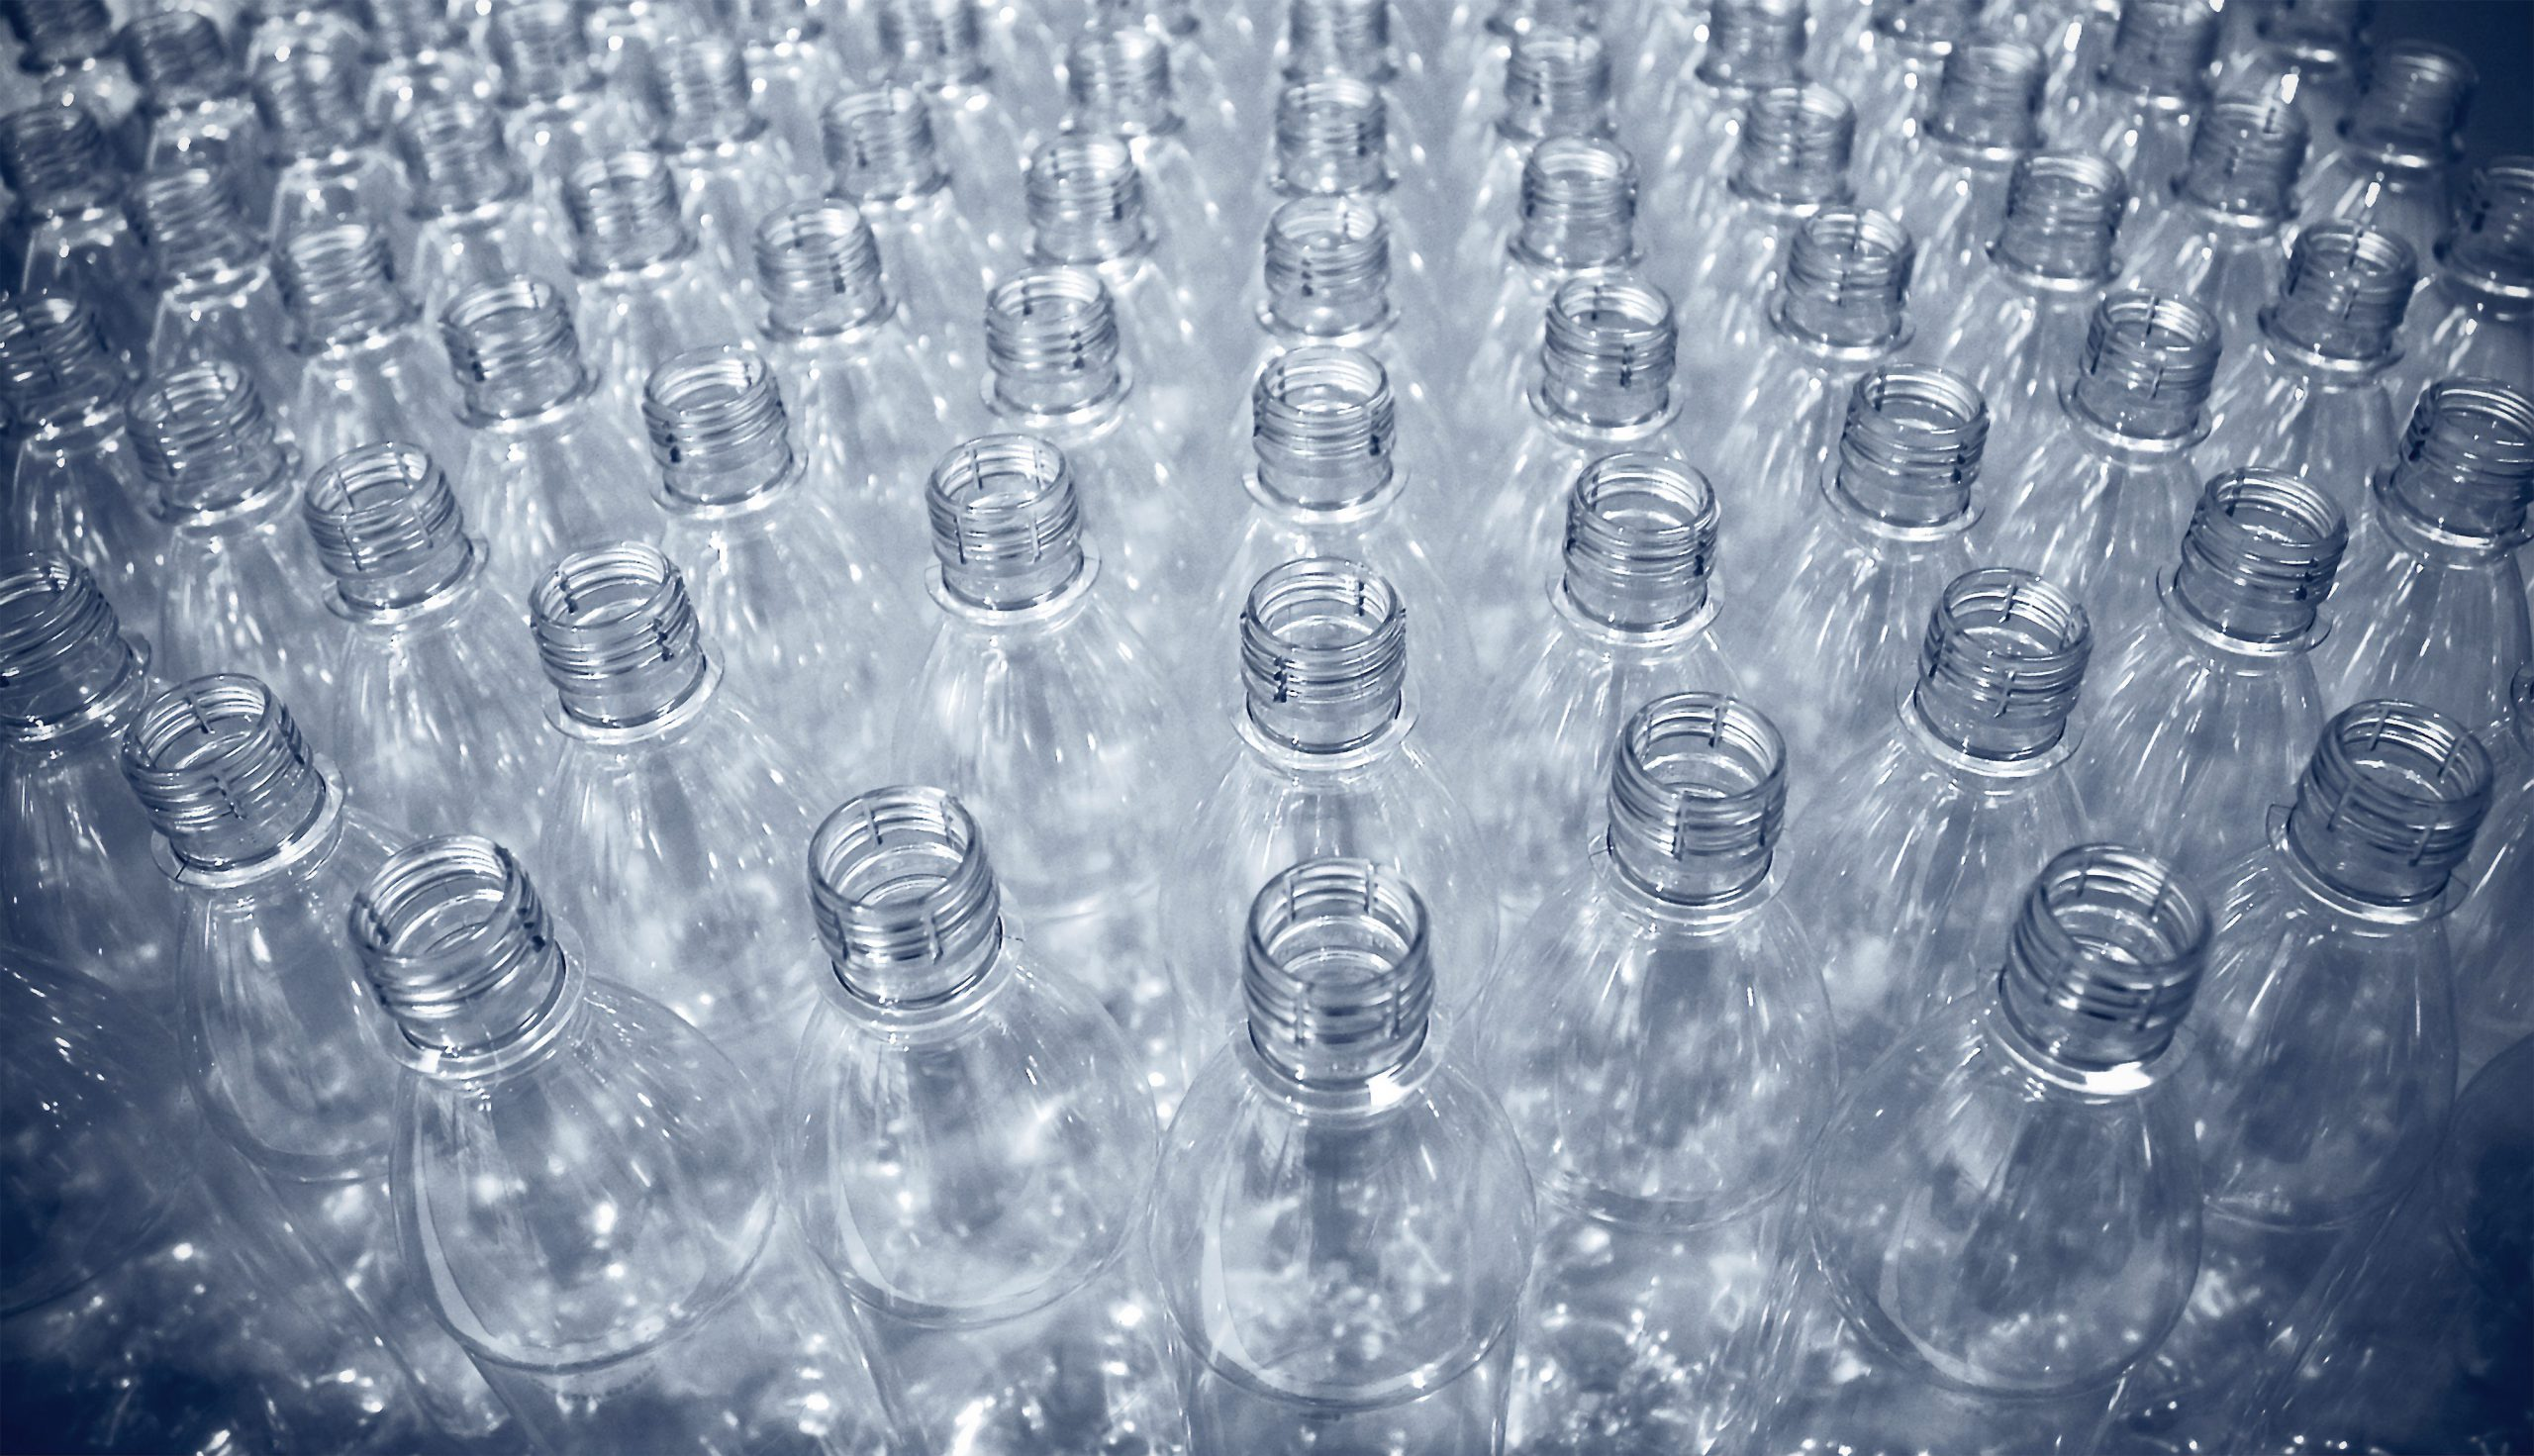 Plastic bottles empty